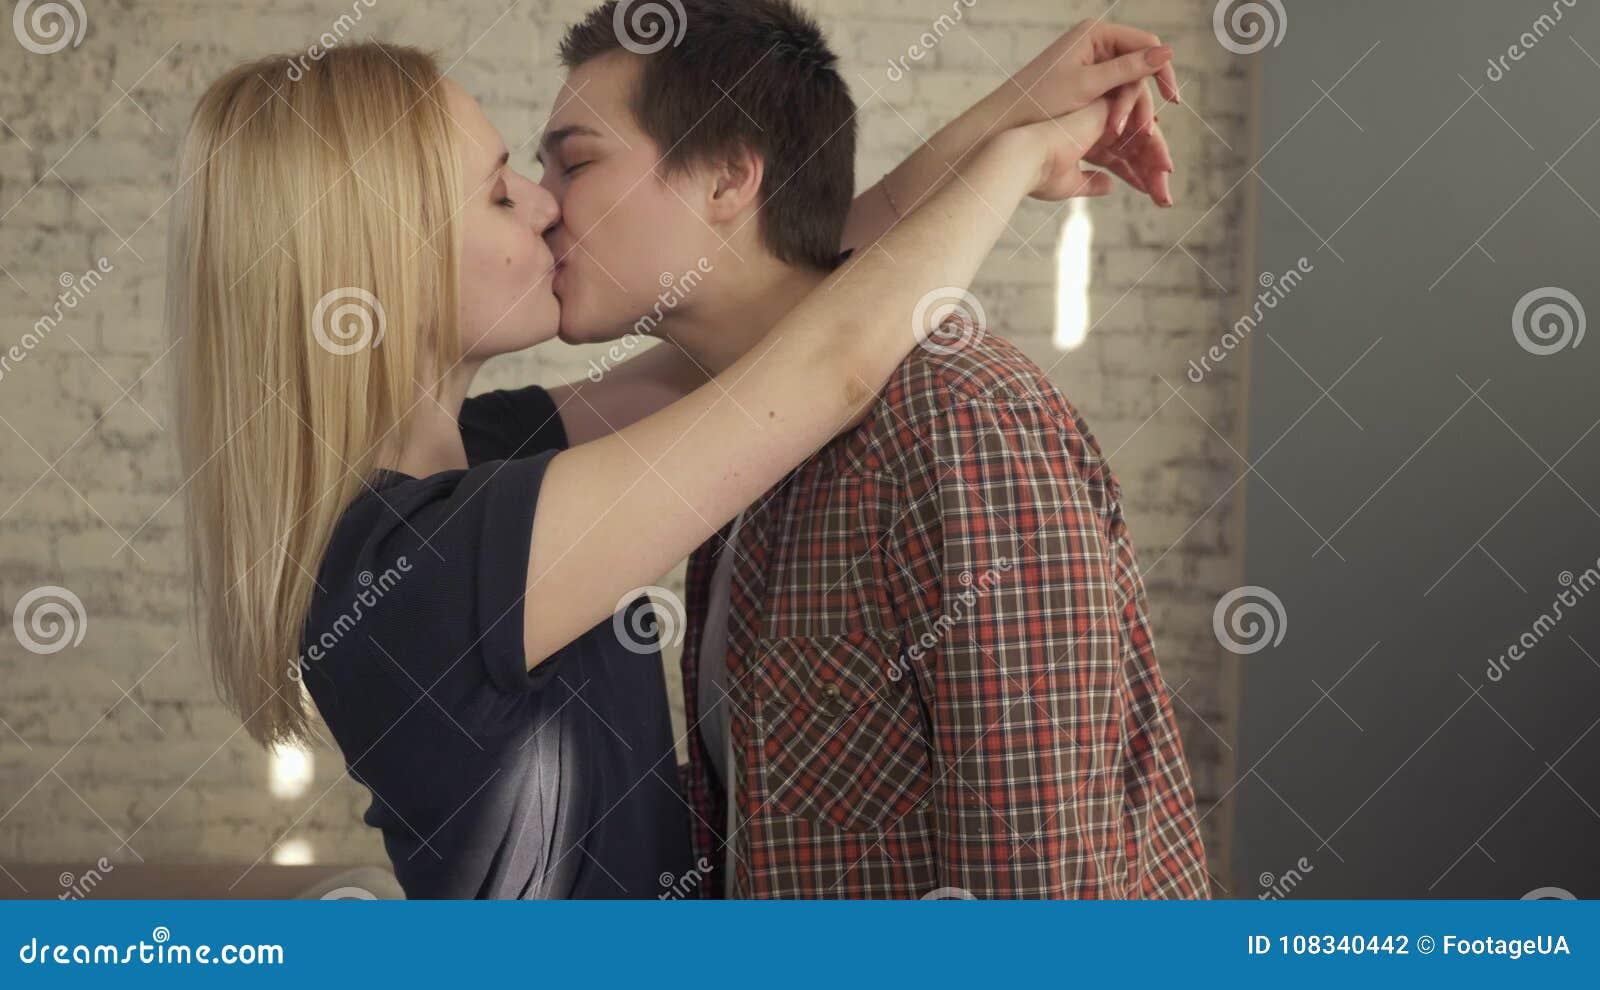 Girls passionately kissing